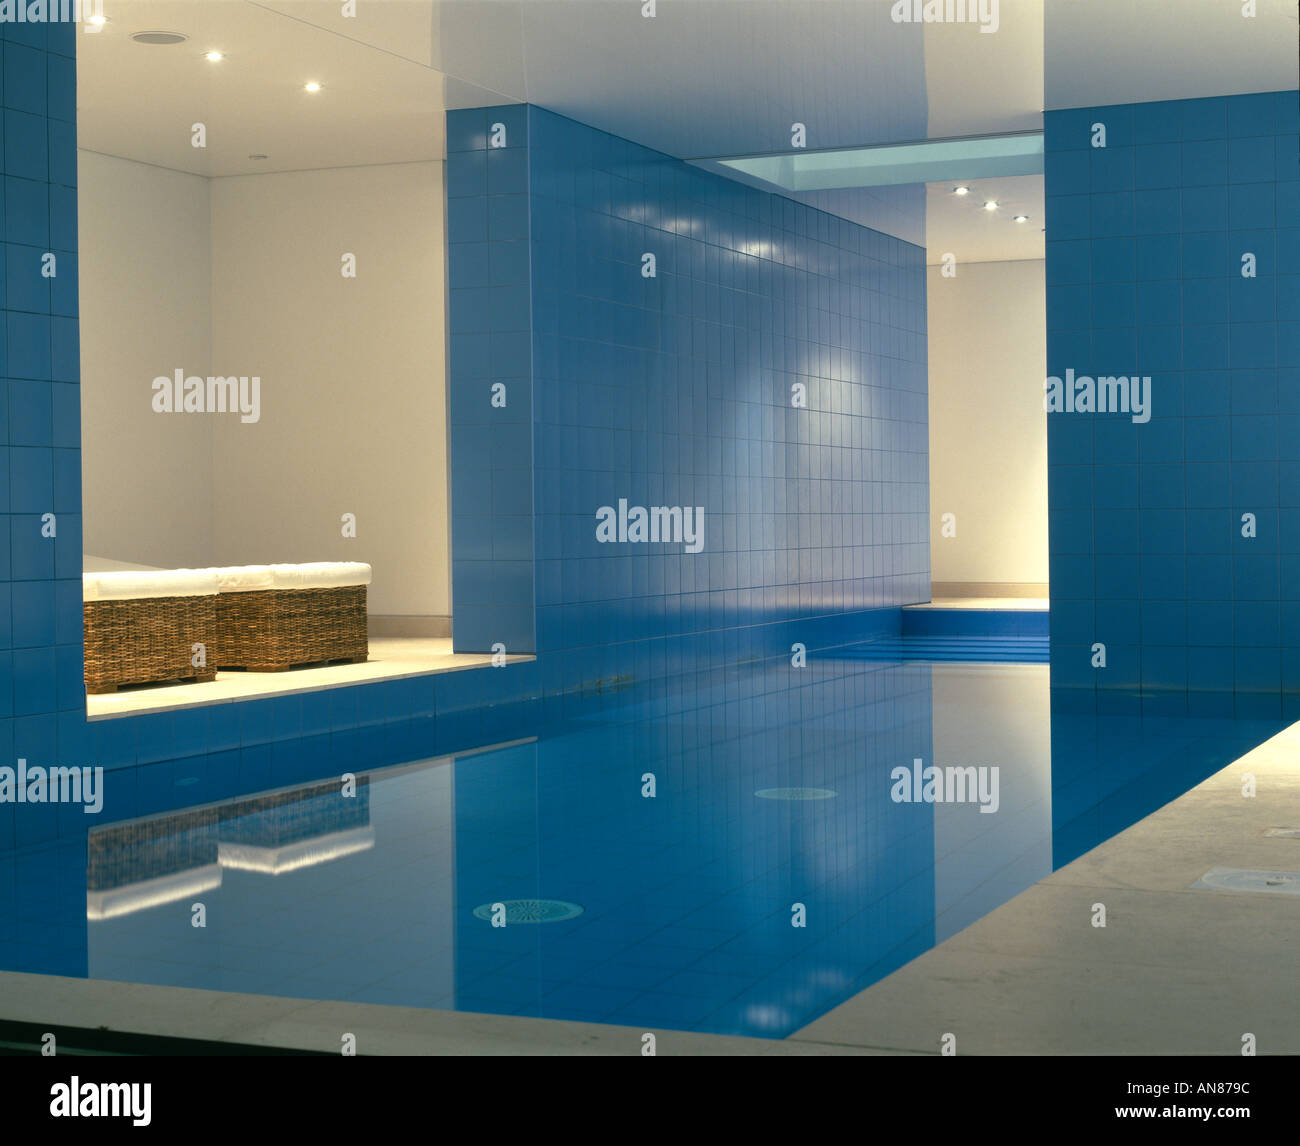 Modernes Haus mit Keller Pool, Hampstead - Innen - Swimmingpool ...